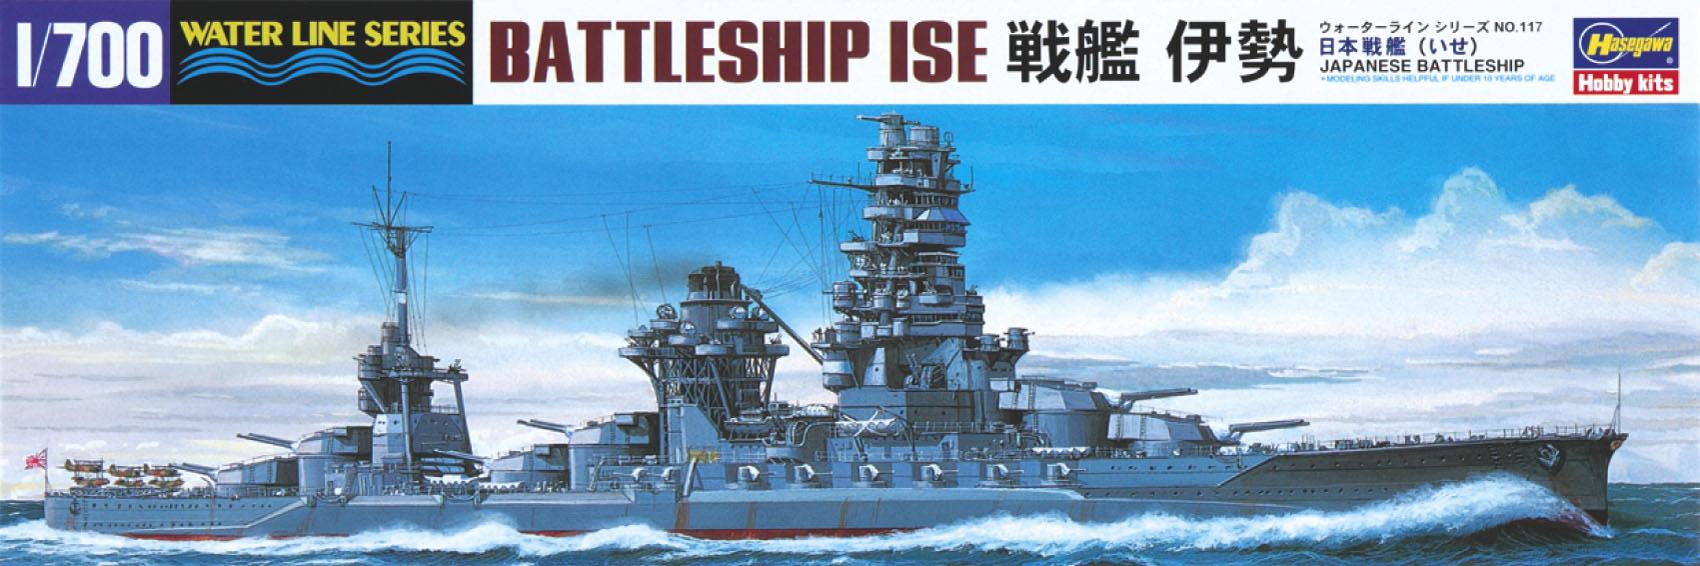 Hasegawa Ijn Battleship Ise